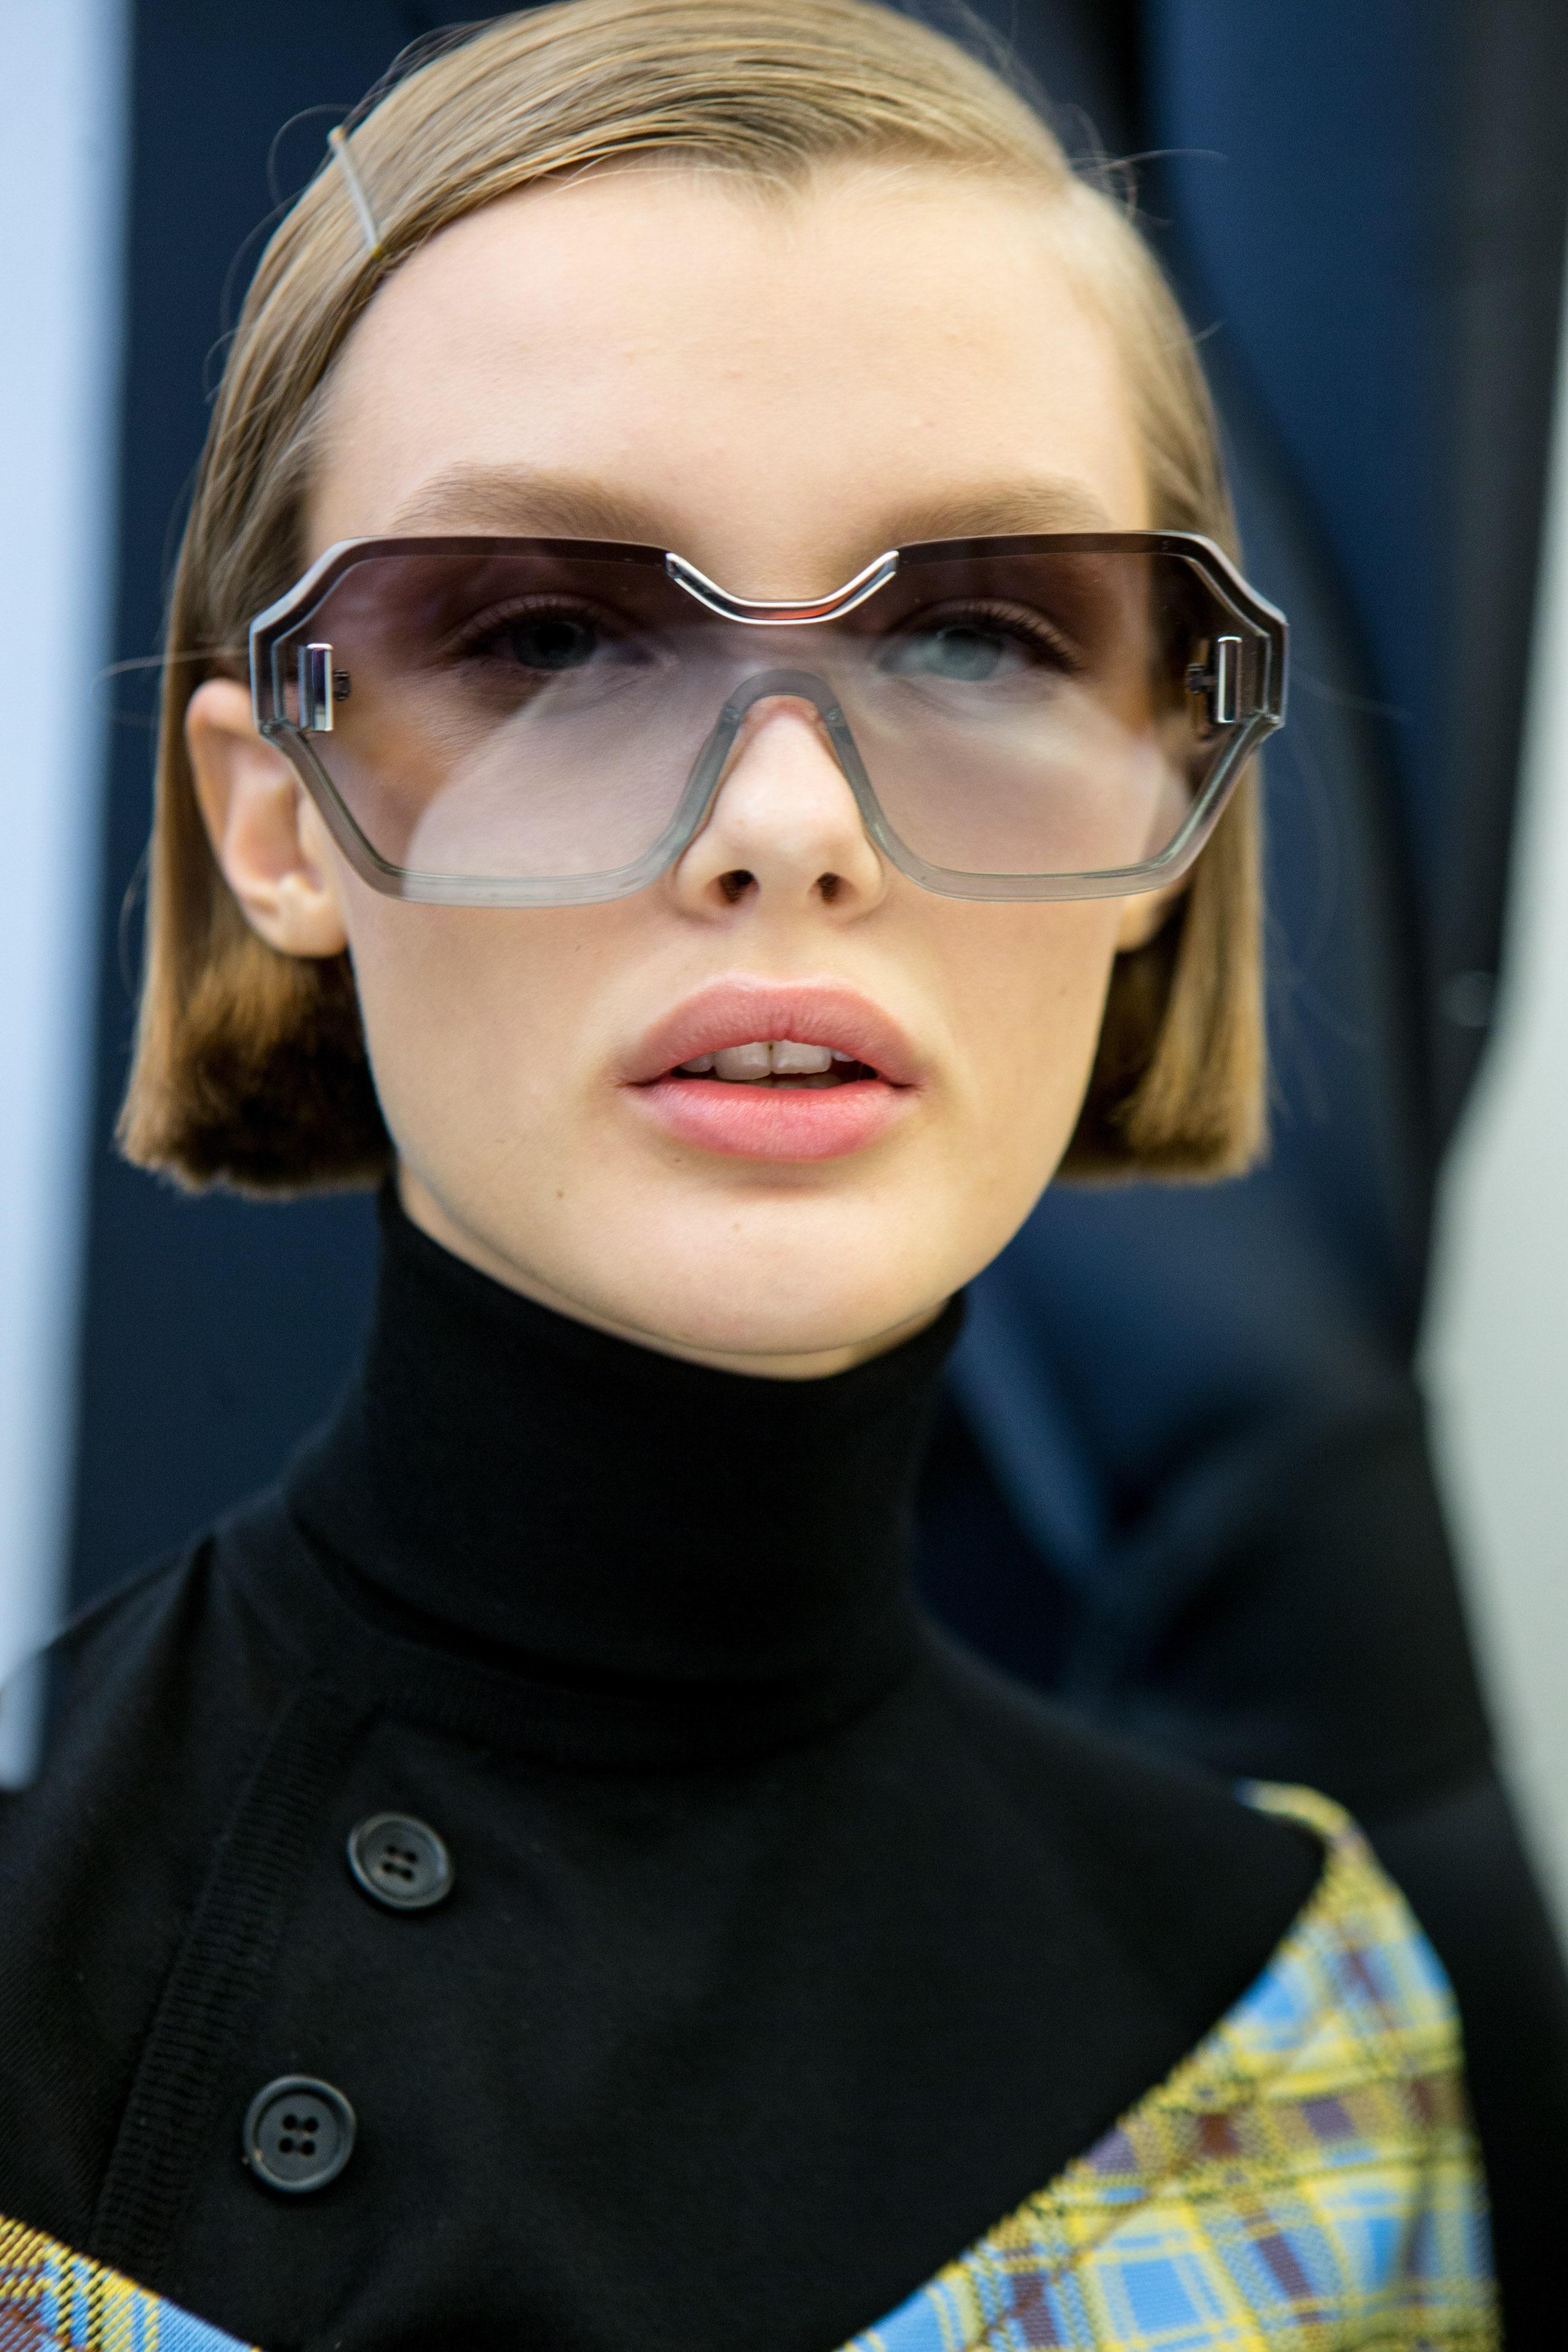 bob haircut with sunglasses Prada SS17